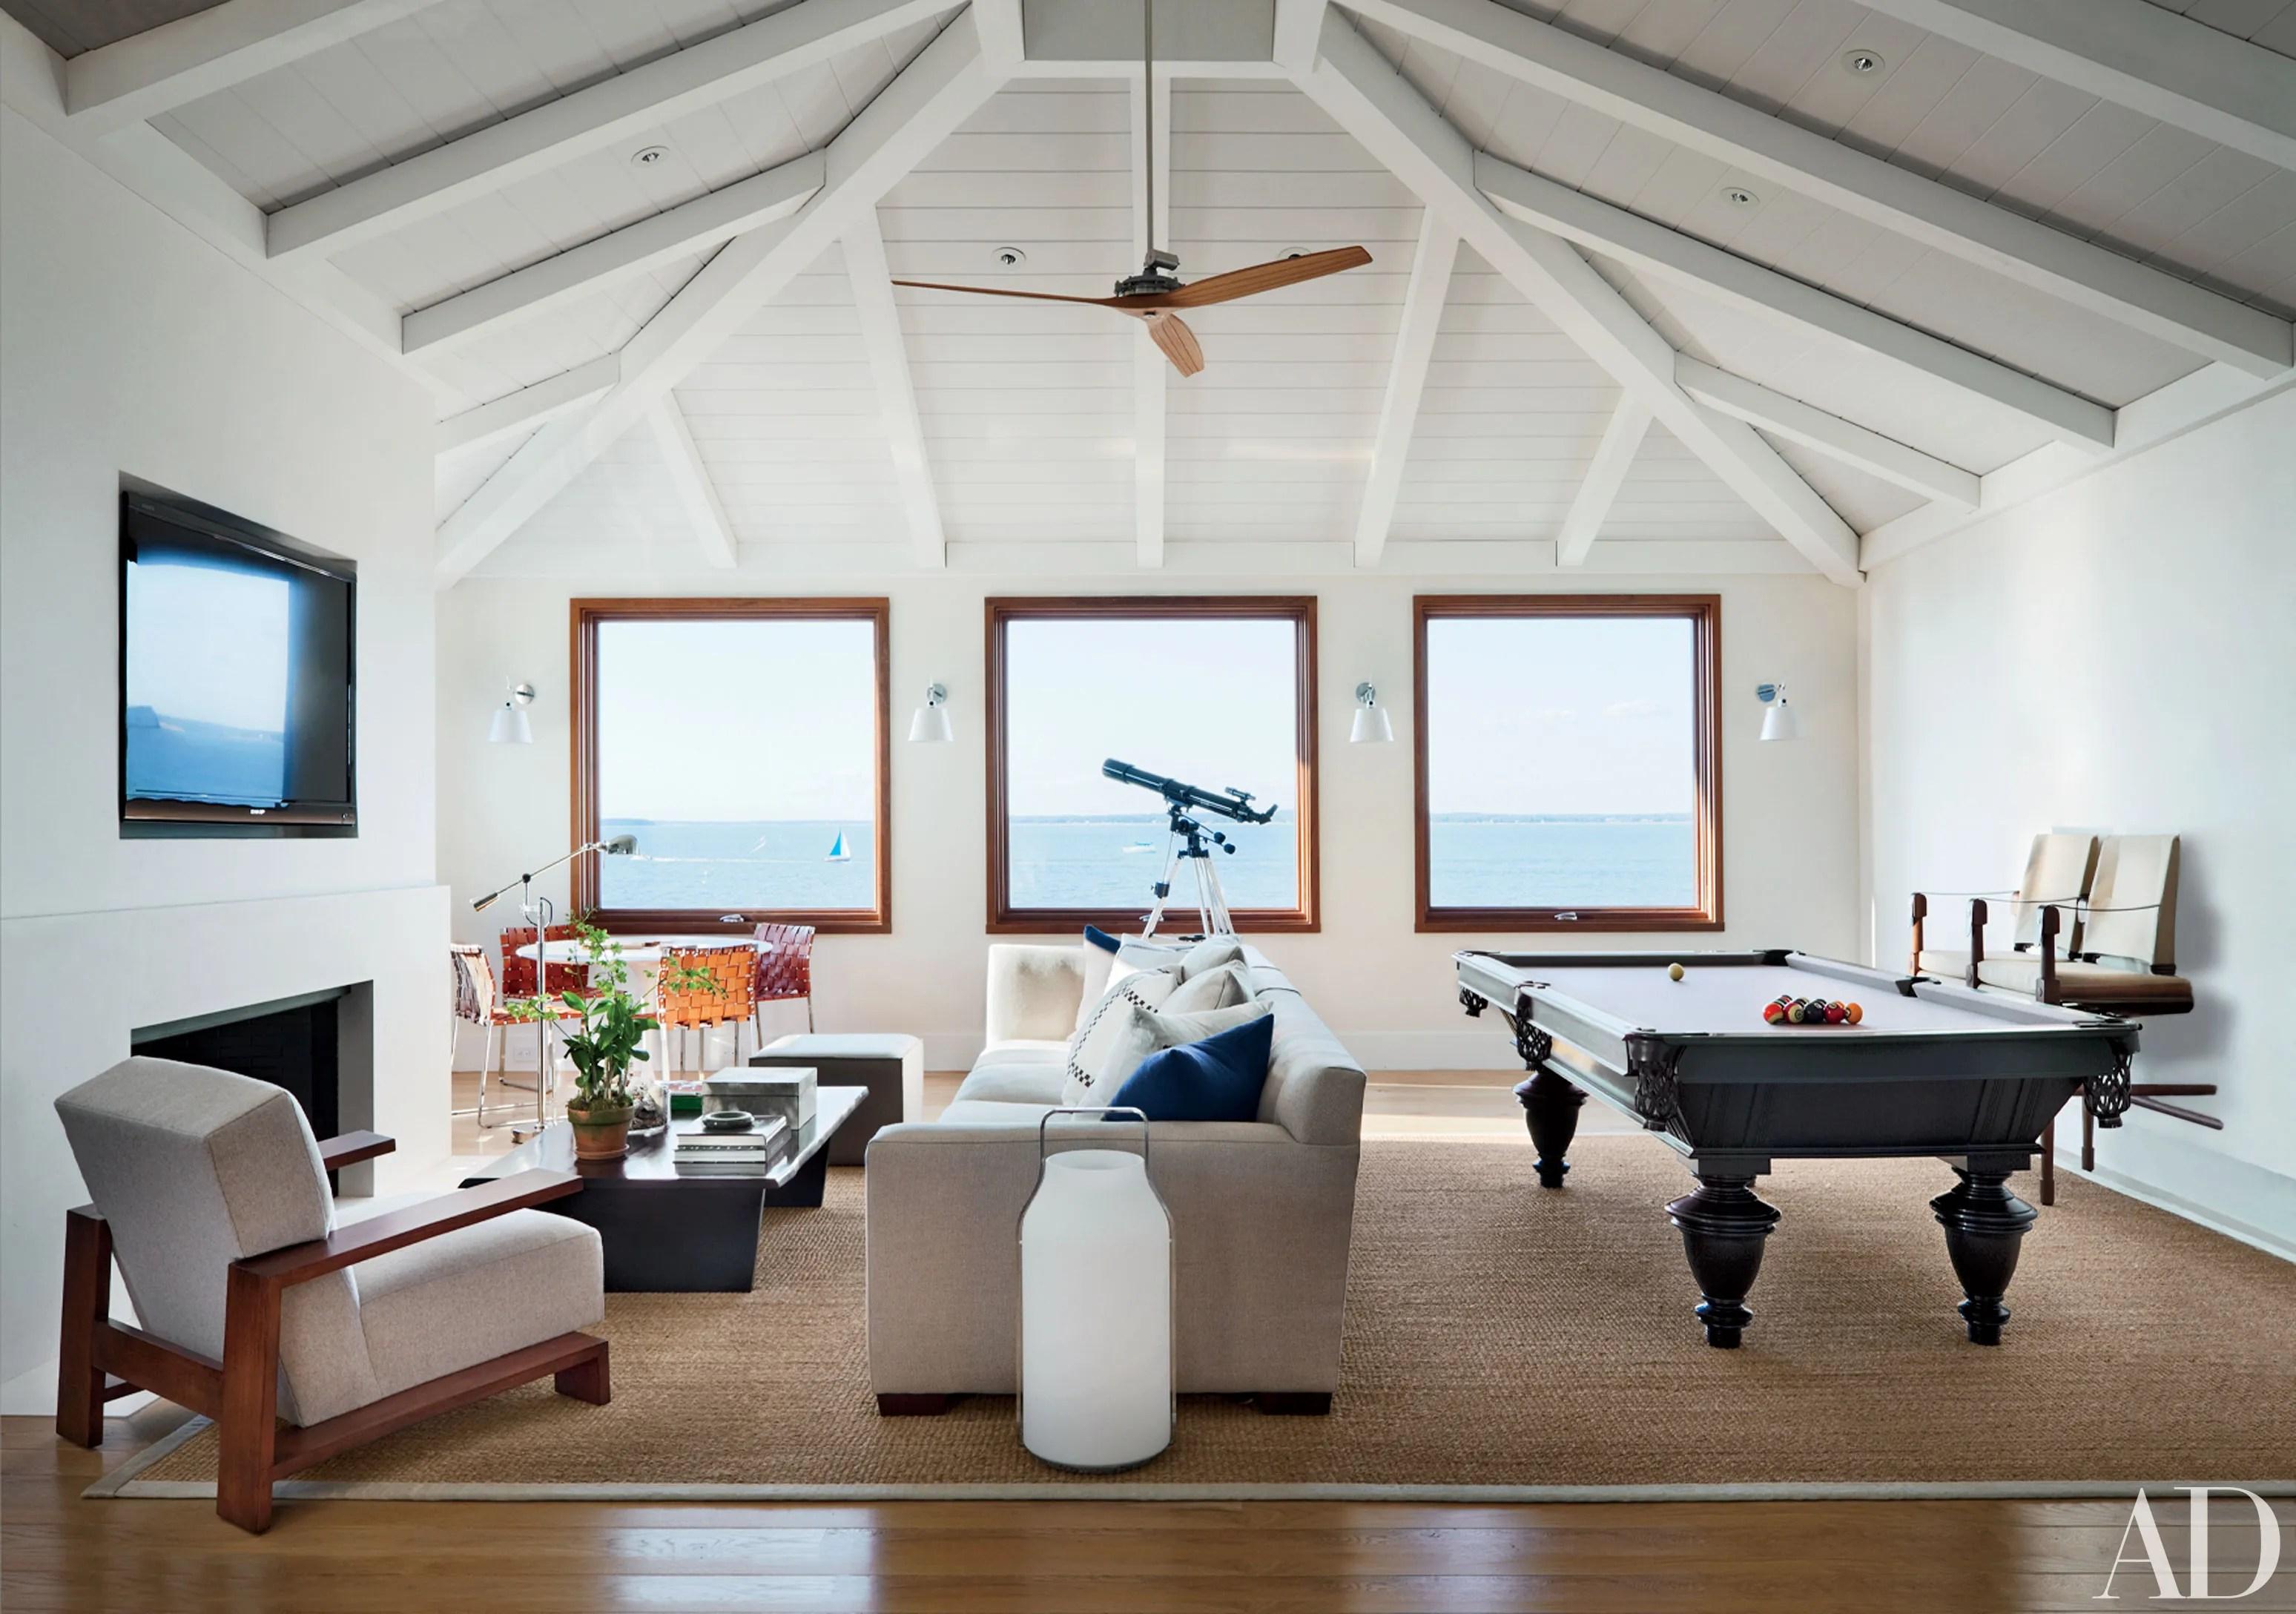 The Best Ceiling Fans Photos Architectural Digest